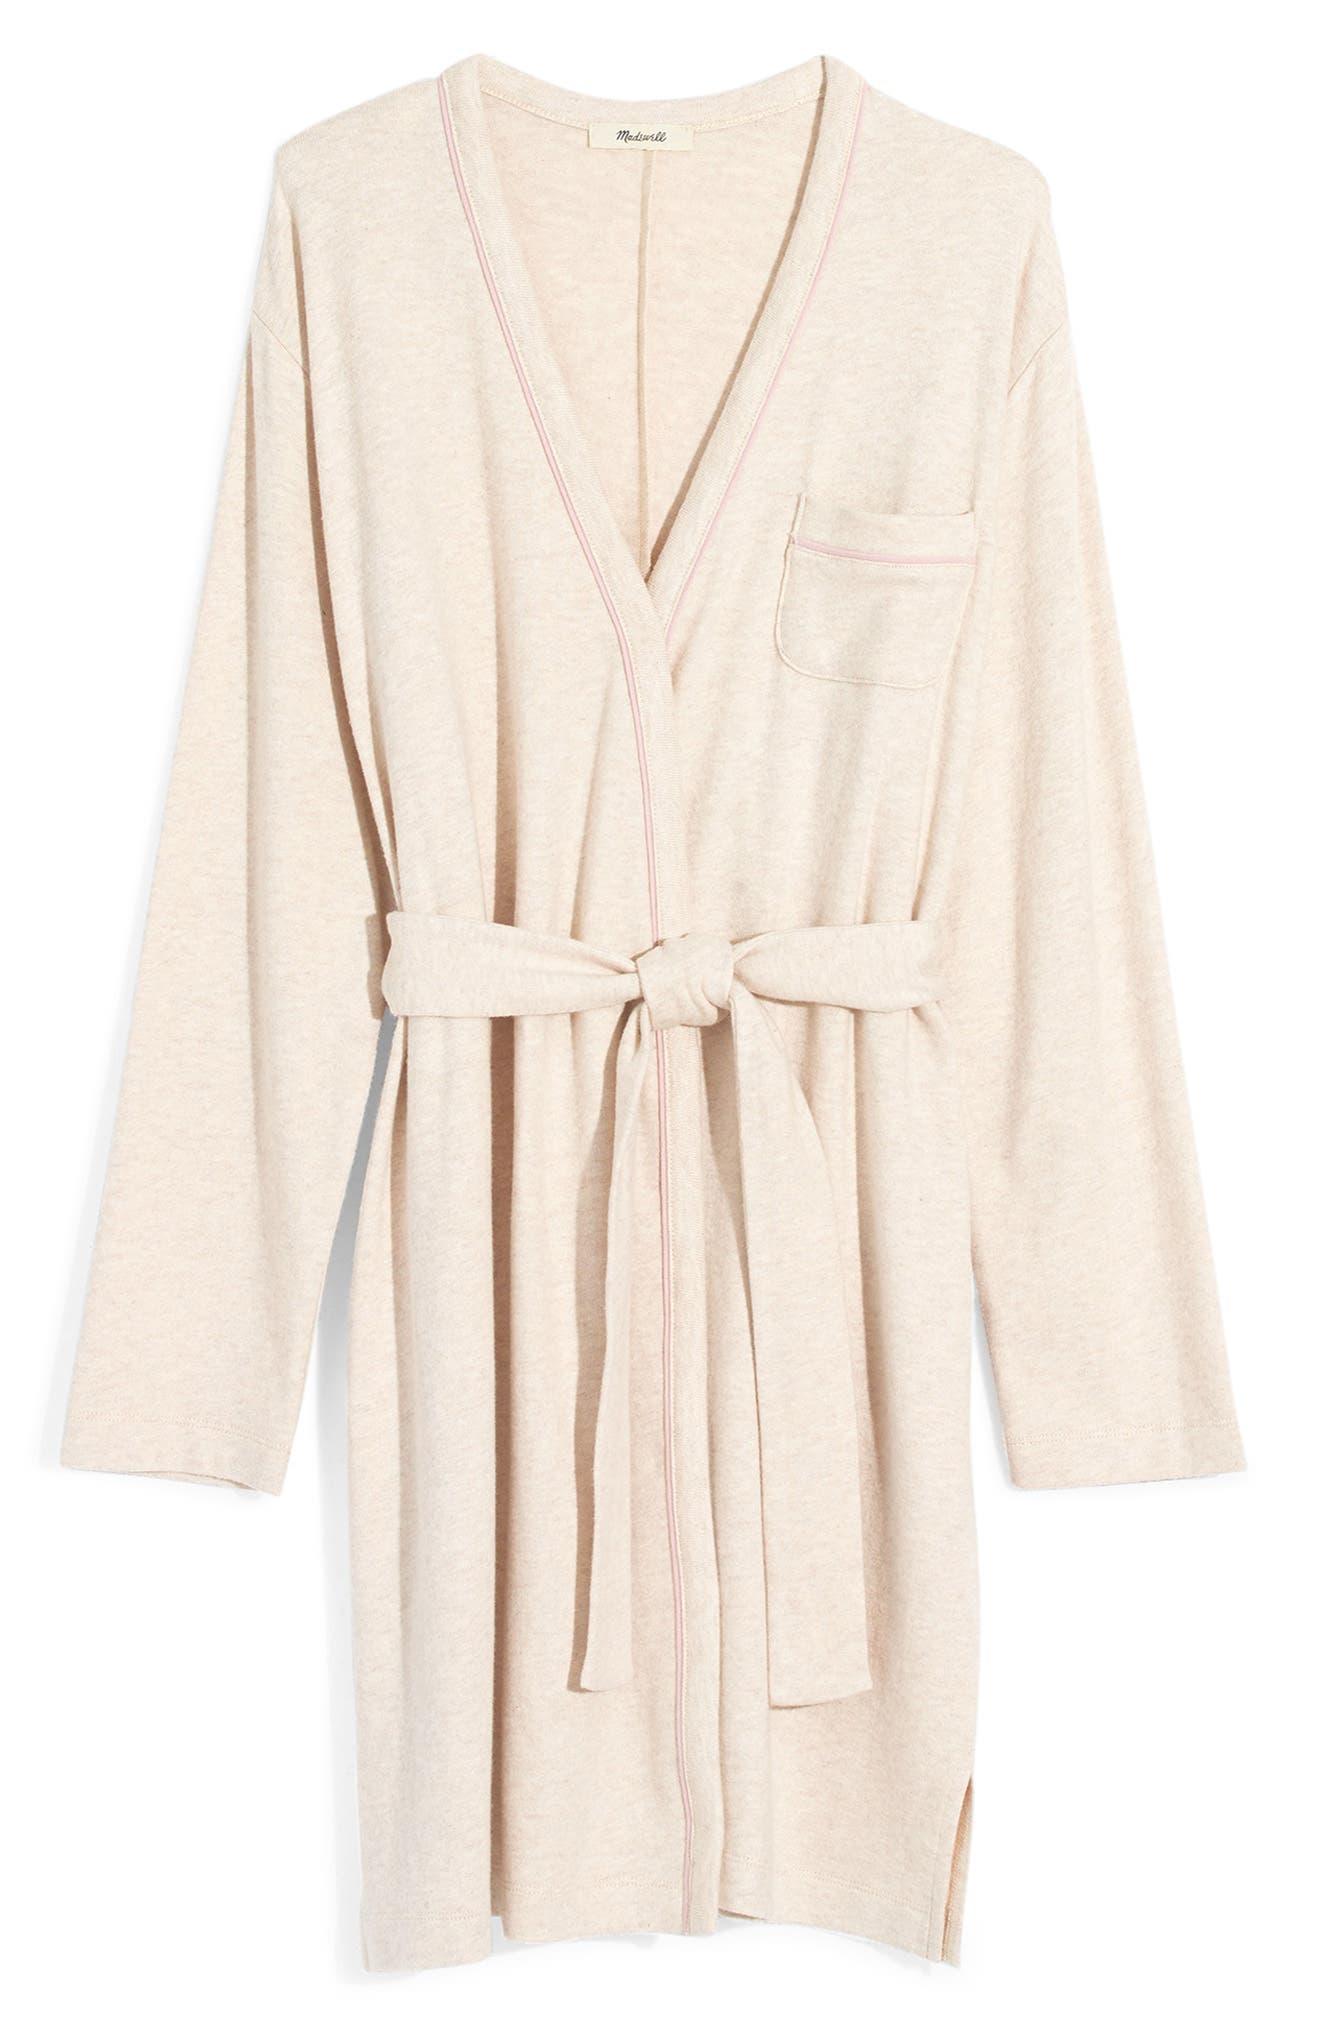 MADEWELL, Tipped Robe, Main thumbnail 1, color, 020